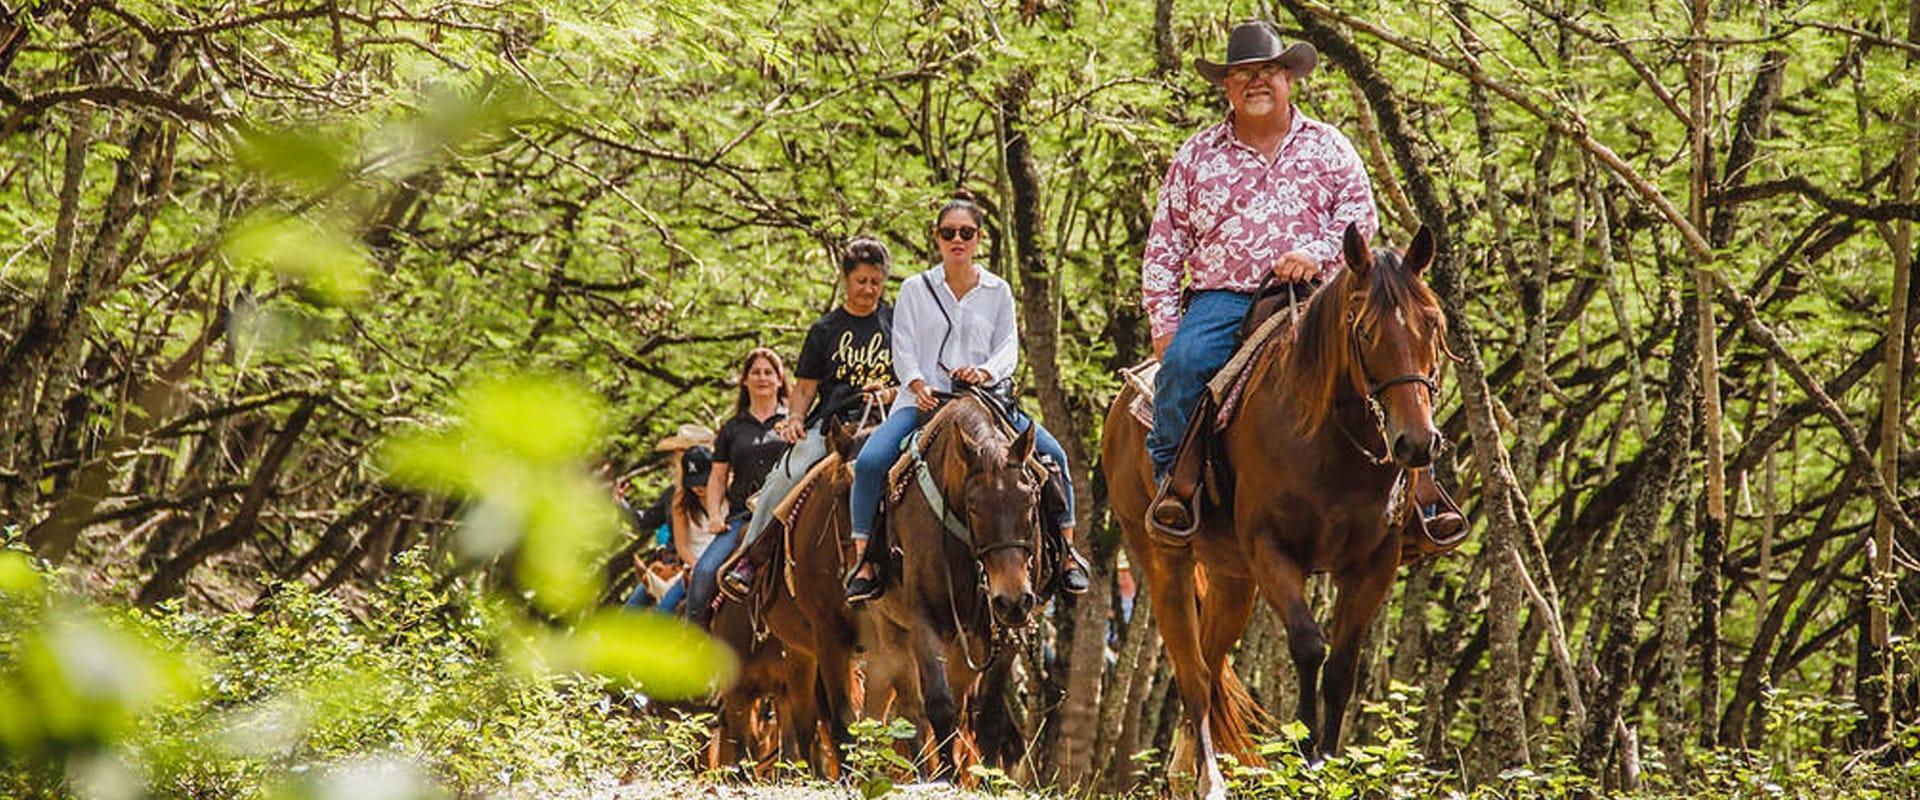 Explore Oahu's famous North Shore on horseback